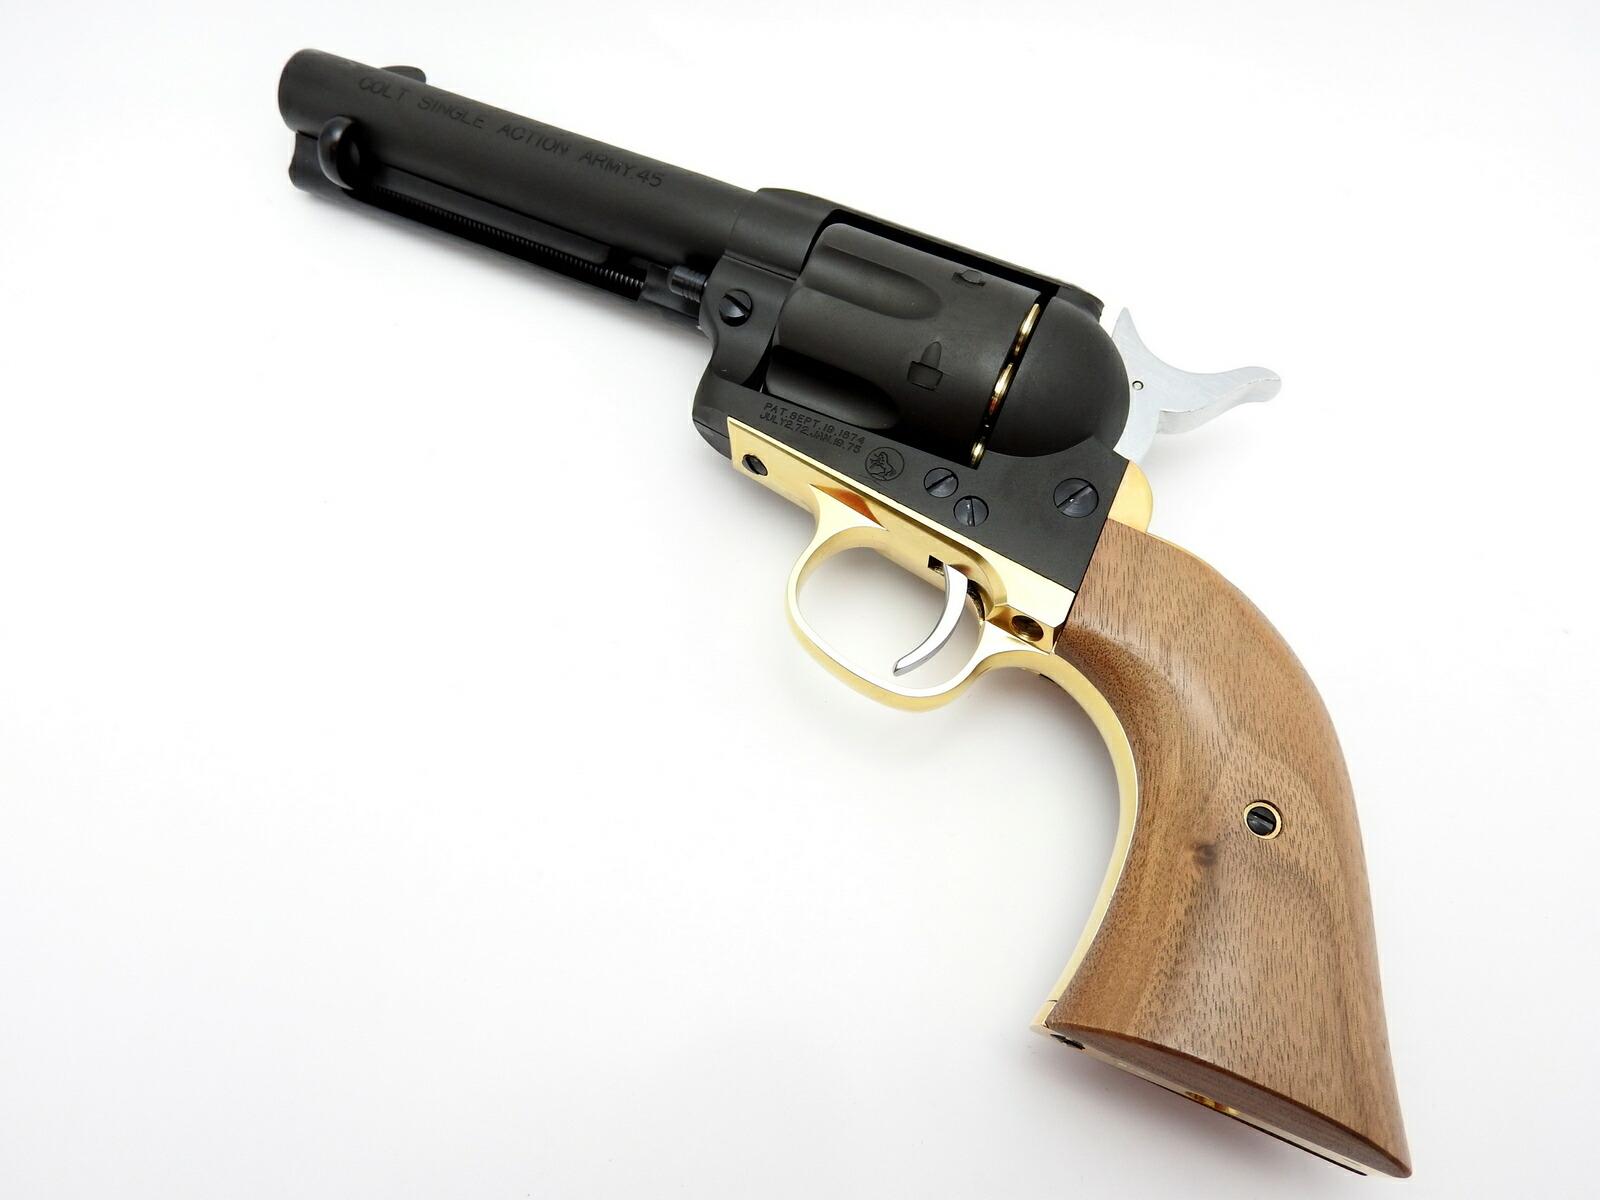 Marushin X-Cartridge Colt Single Action Army (Saa) 45